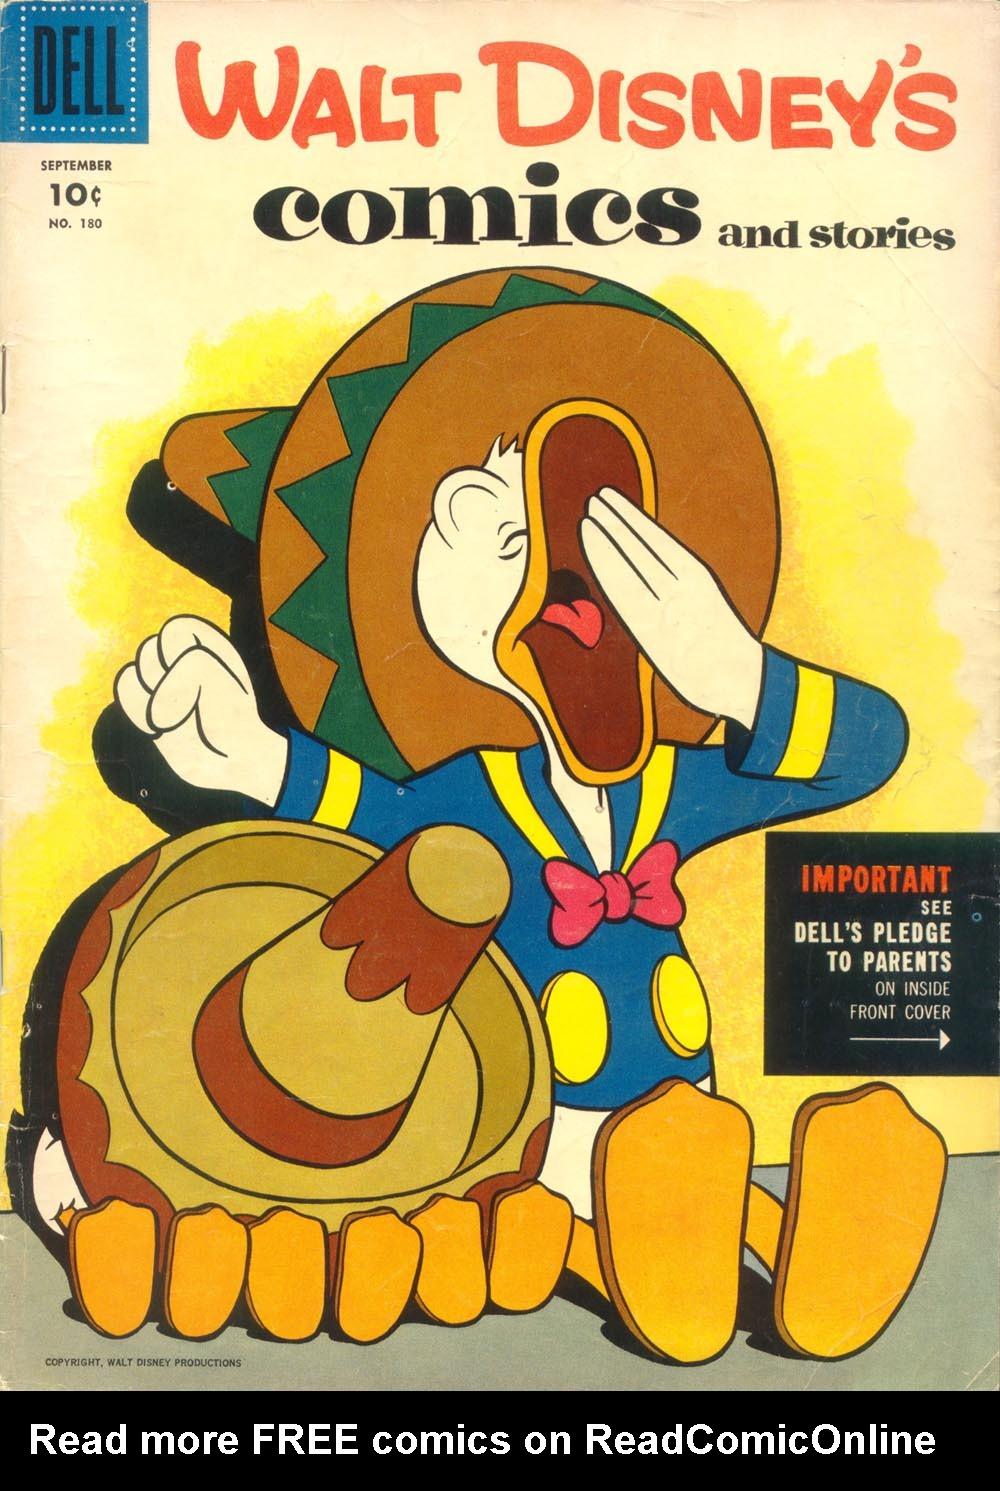 Walt Disneys Comics and Stories 180 Page 1